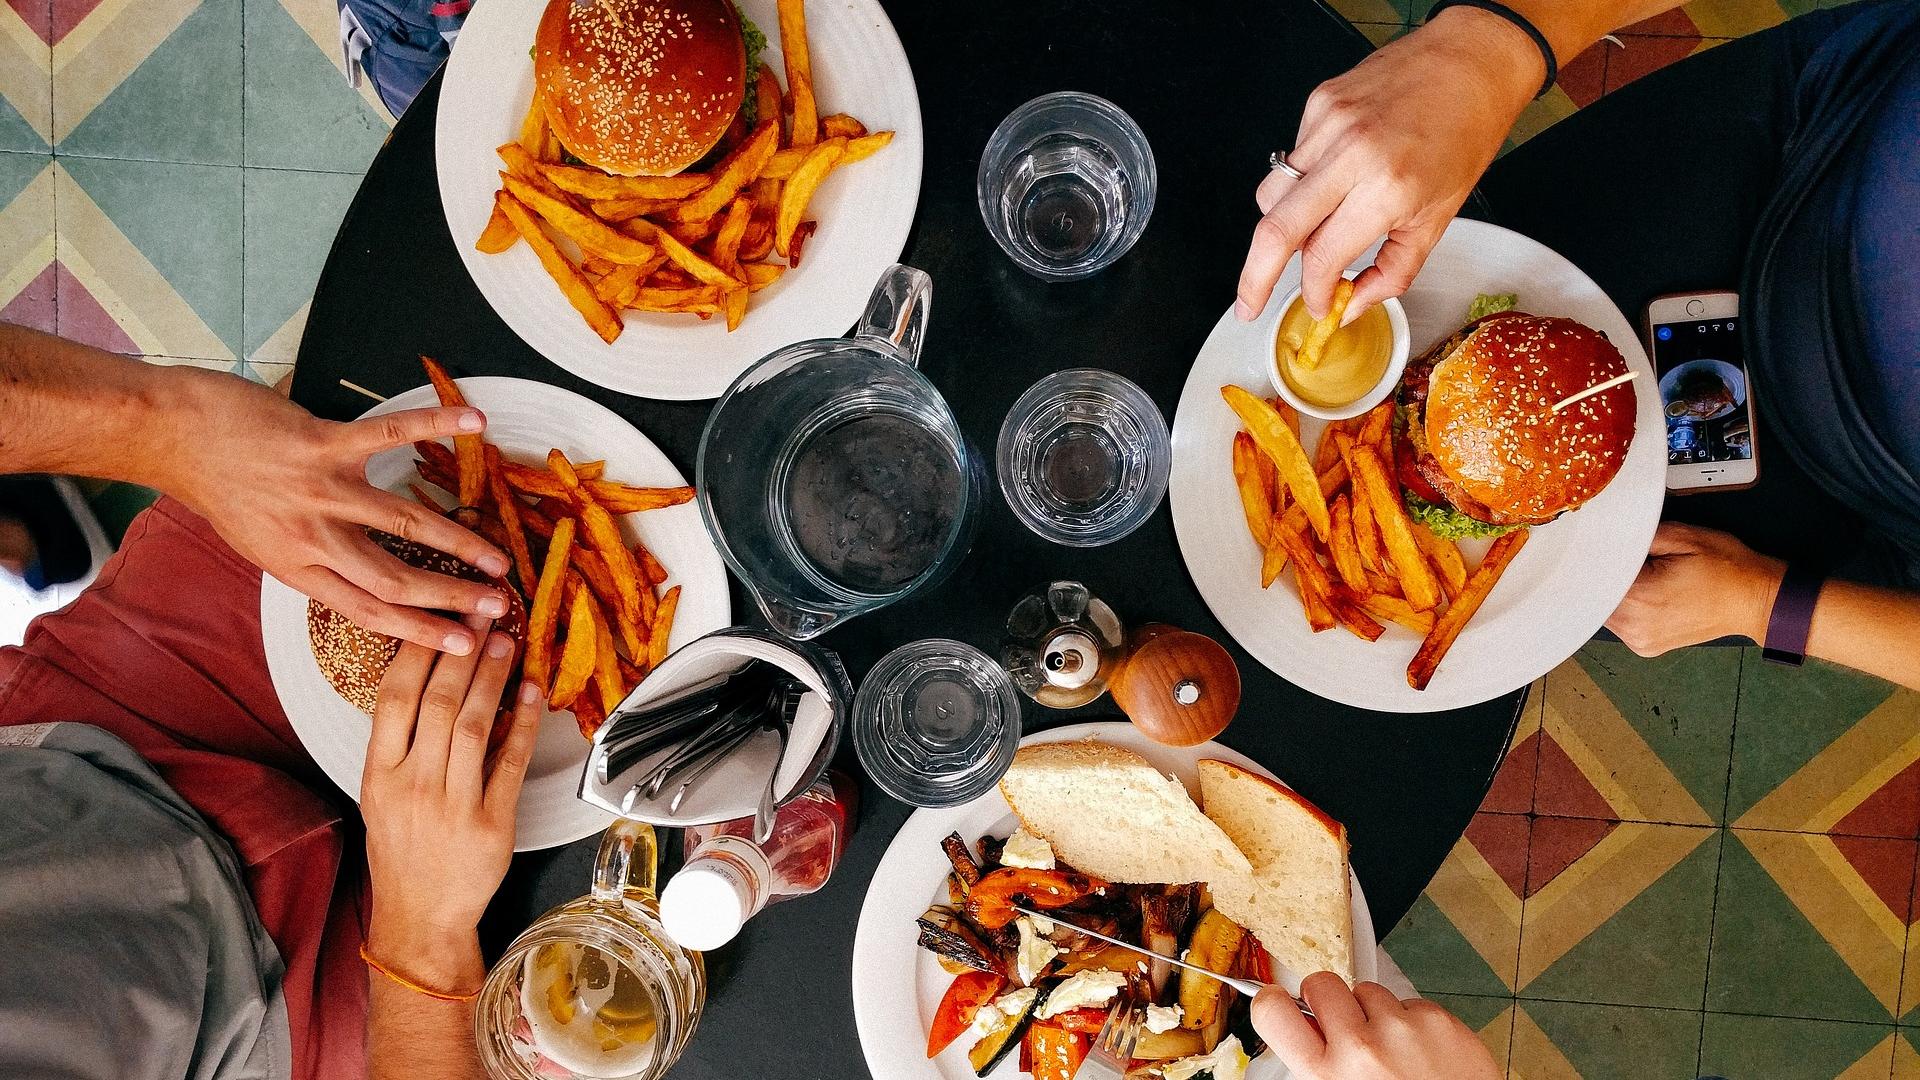 Restaurant Trend Watch: Deals on Meals